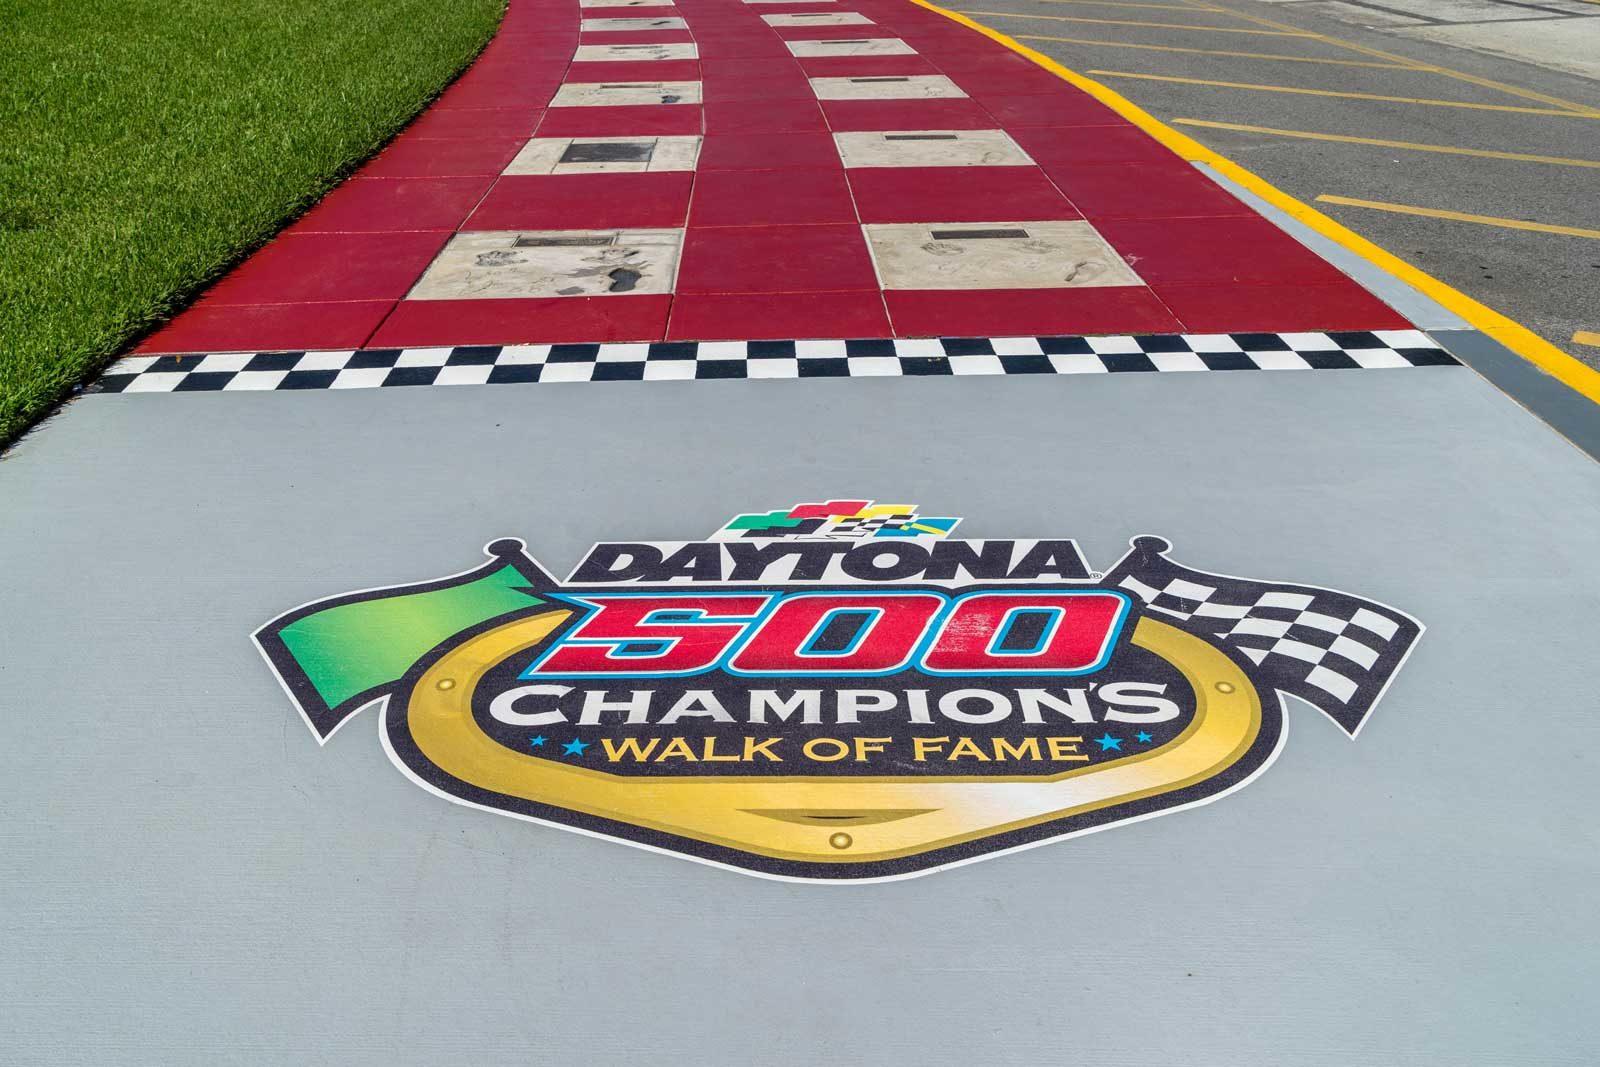 Daytona 500 walk of Champions